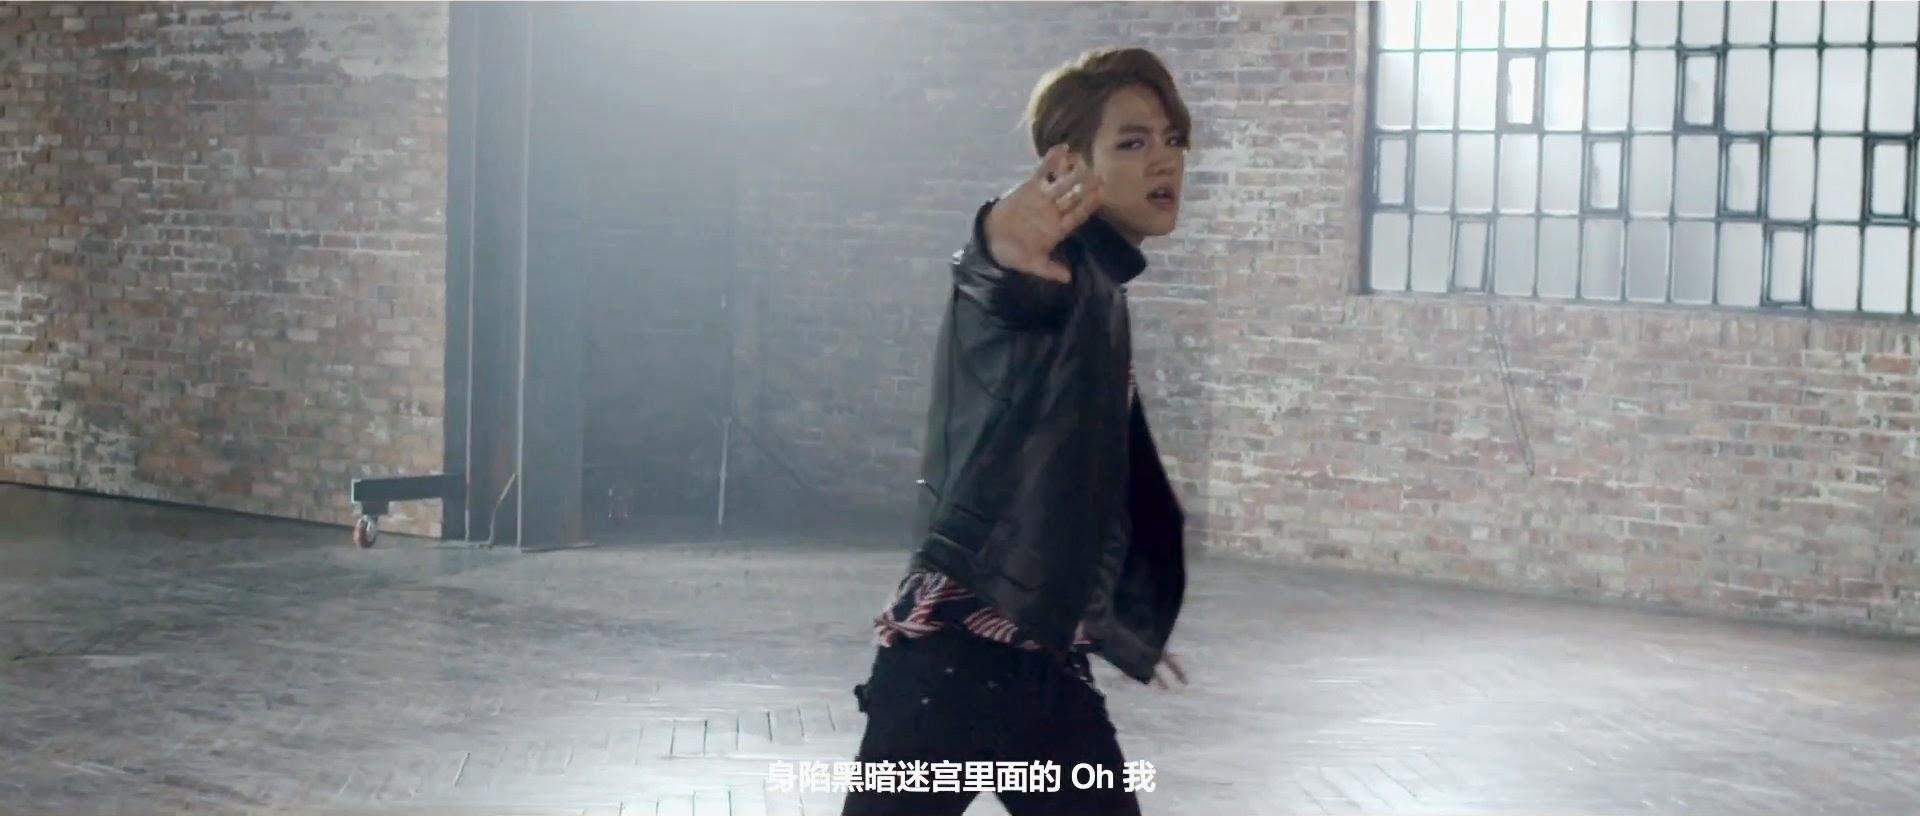 EXO's Baekhyun in Call Me Baby